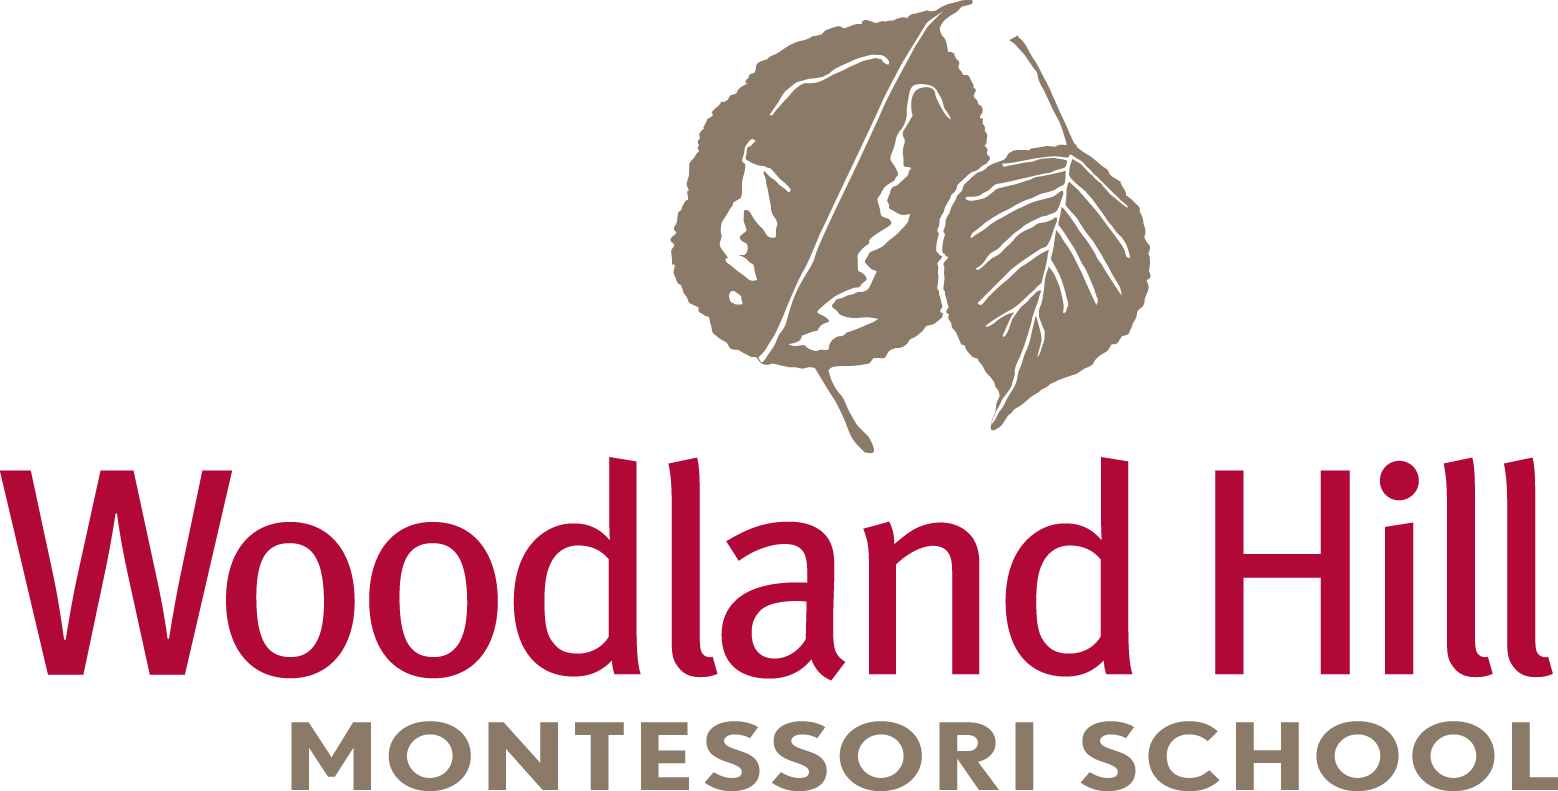 Woodland Hill Montessori School logo